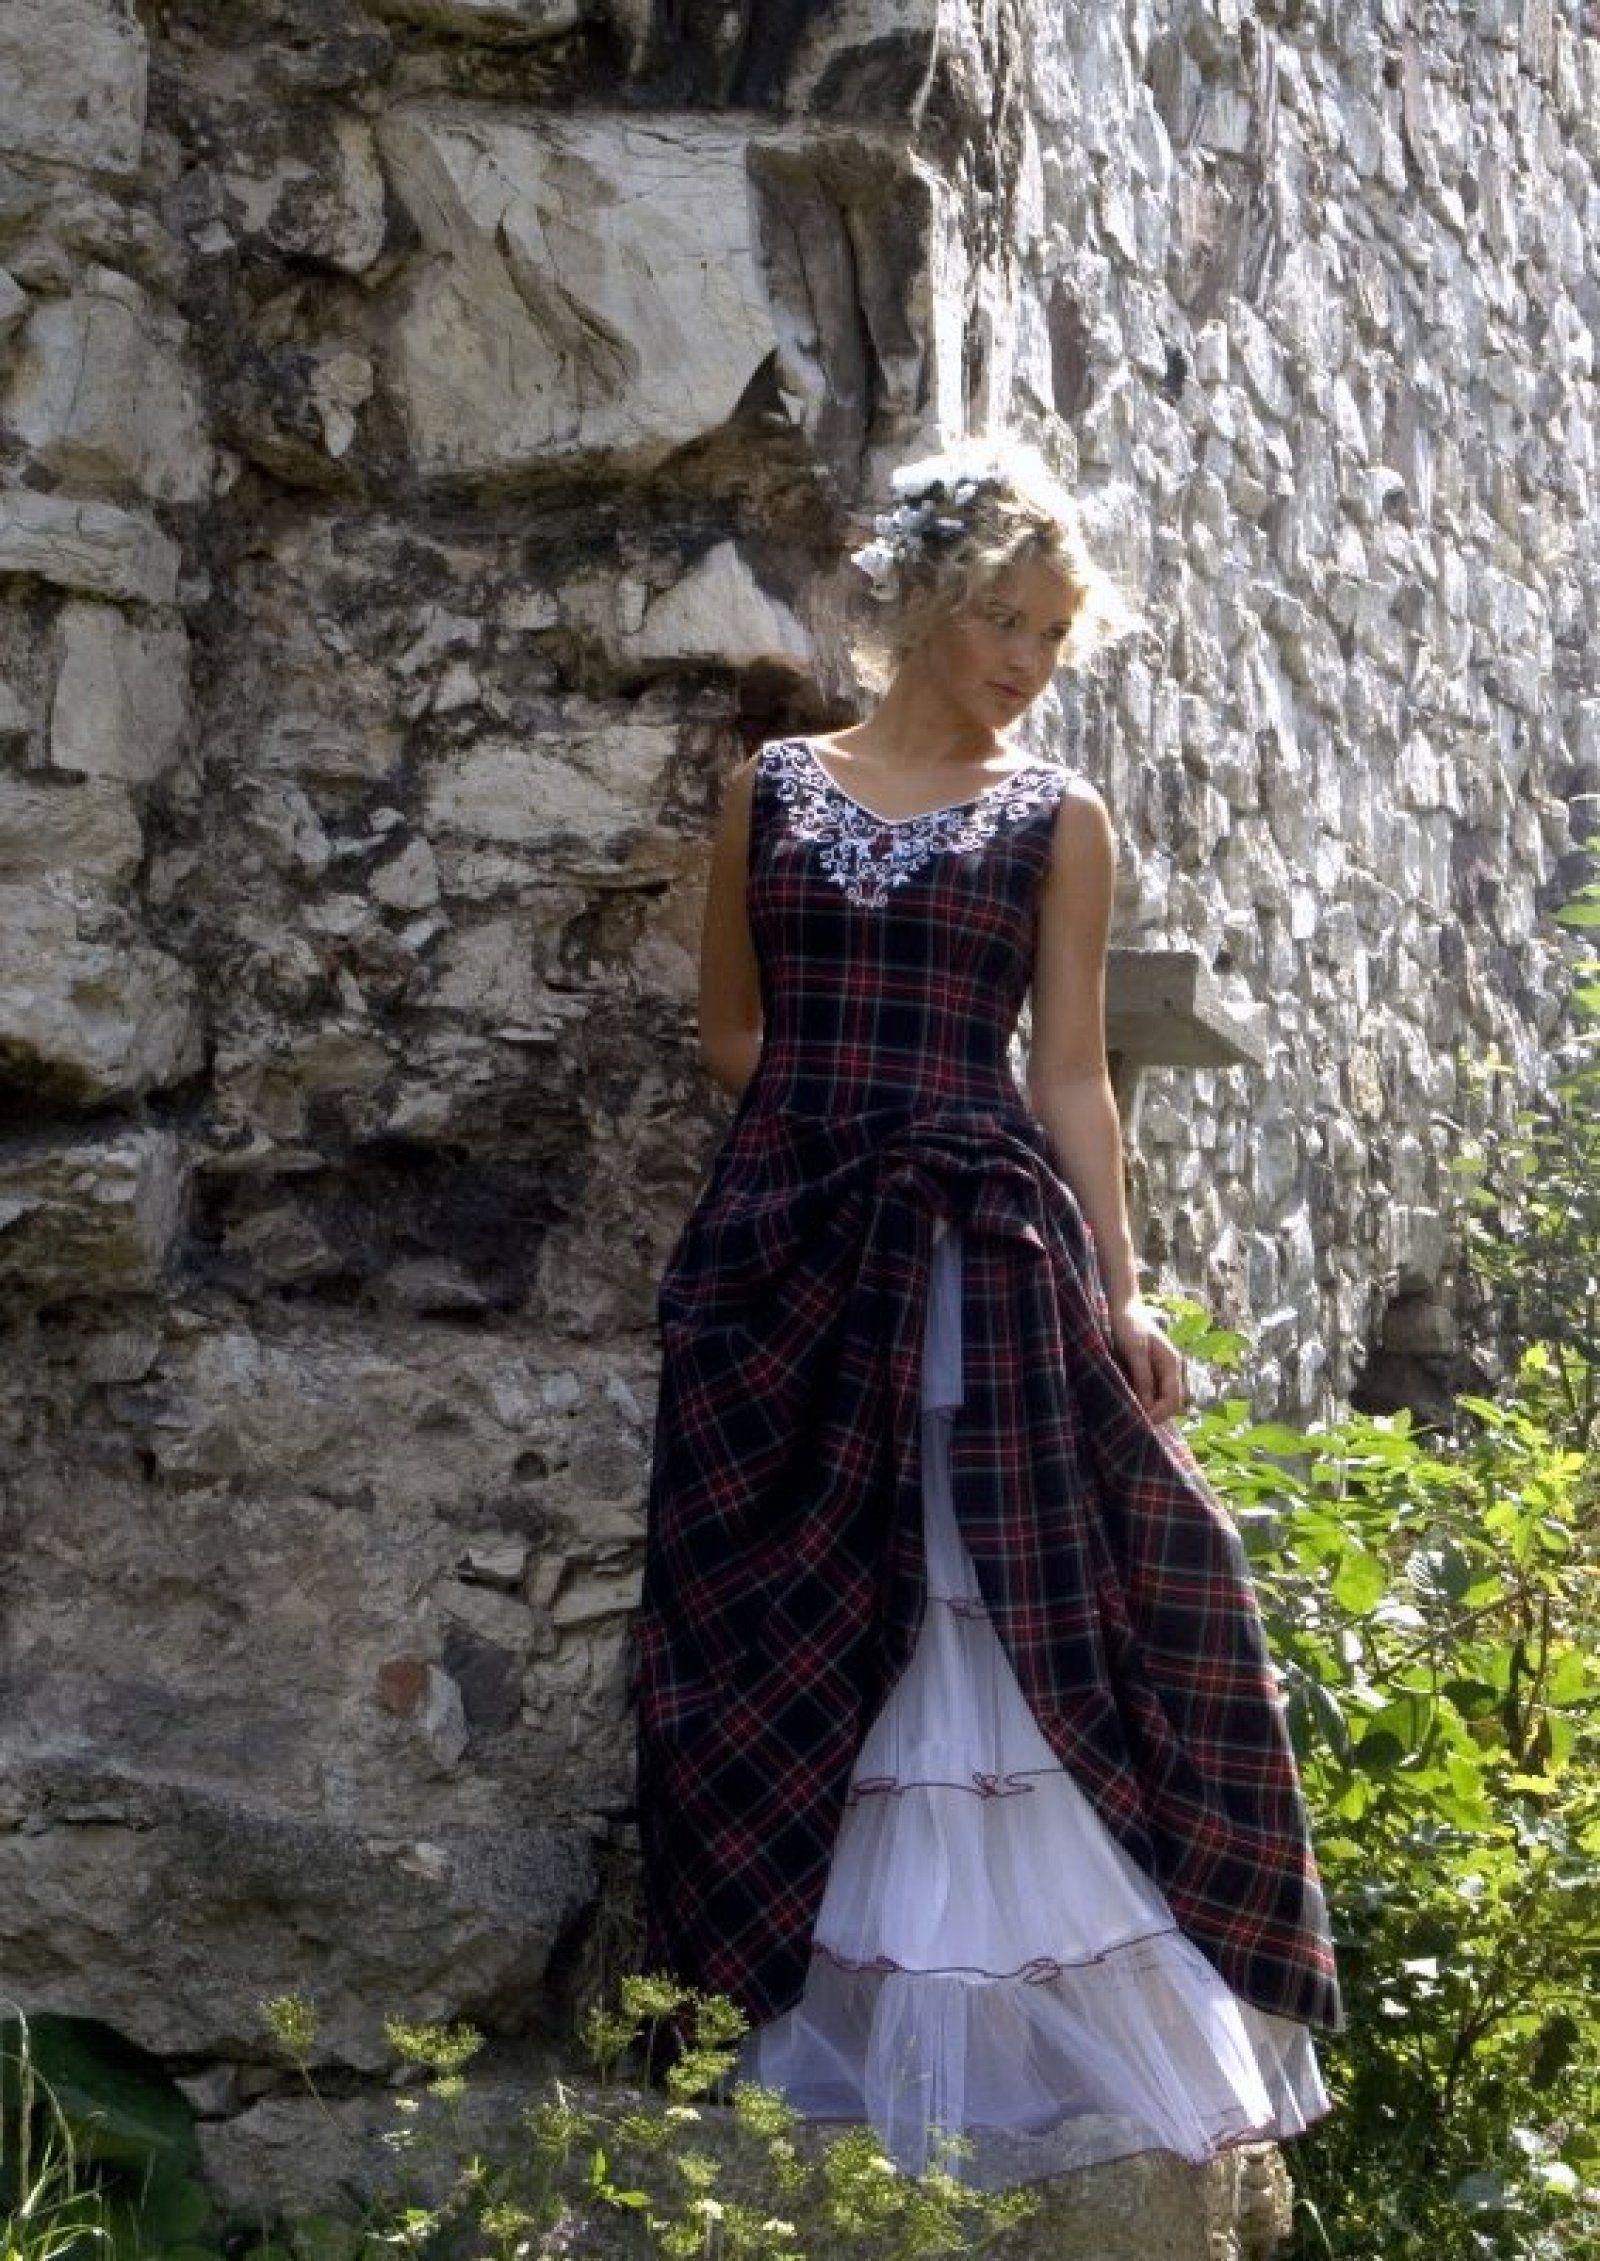 Scottish wedding dresses  Tartan wedding dress  Kilt Dreams  Pinterest  Plaid wedding